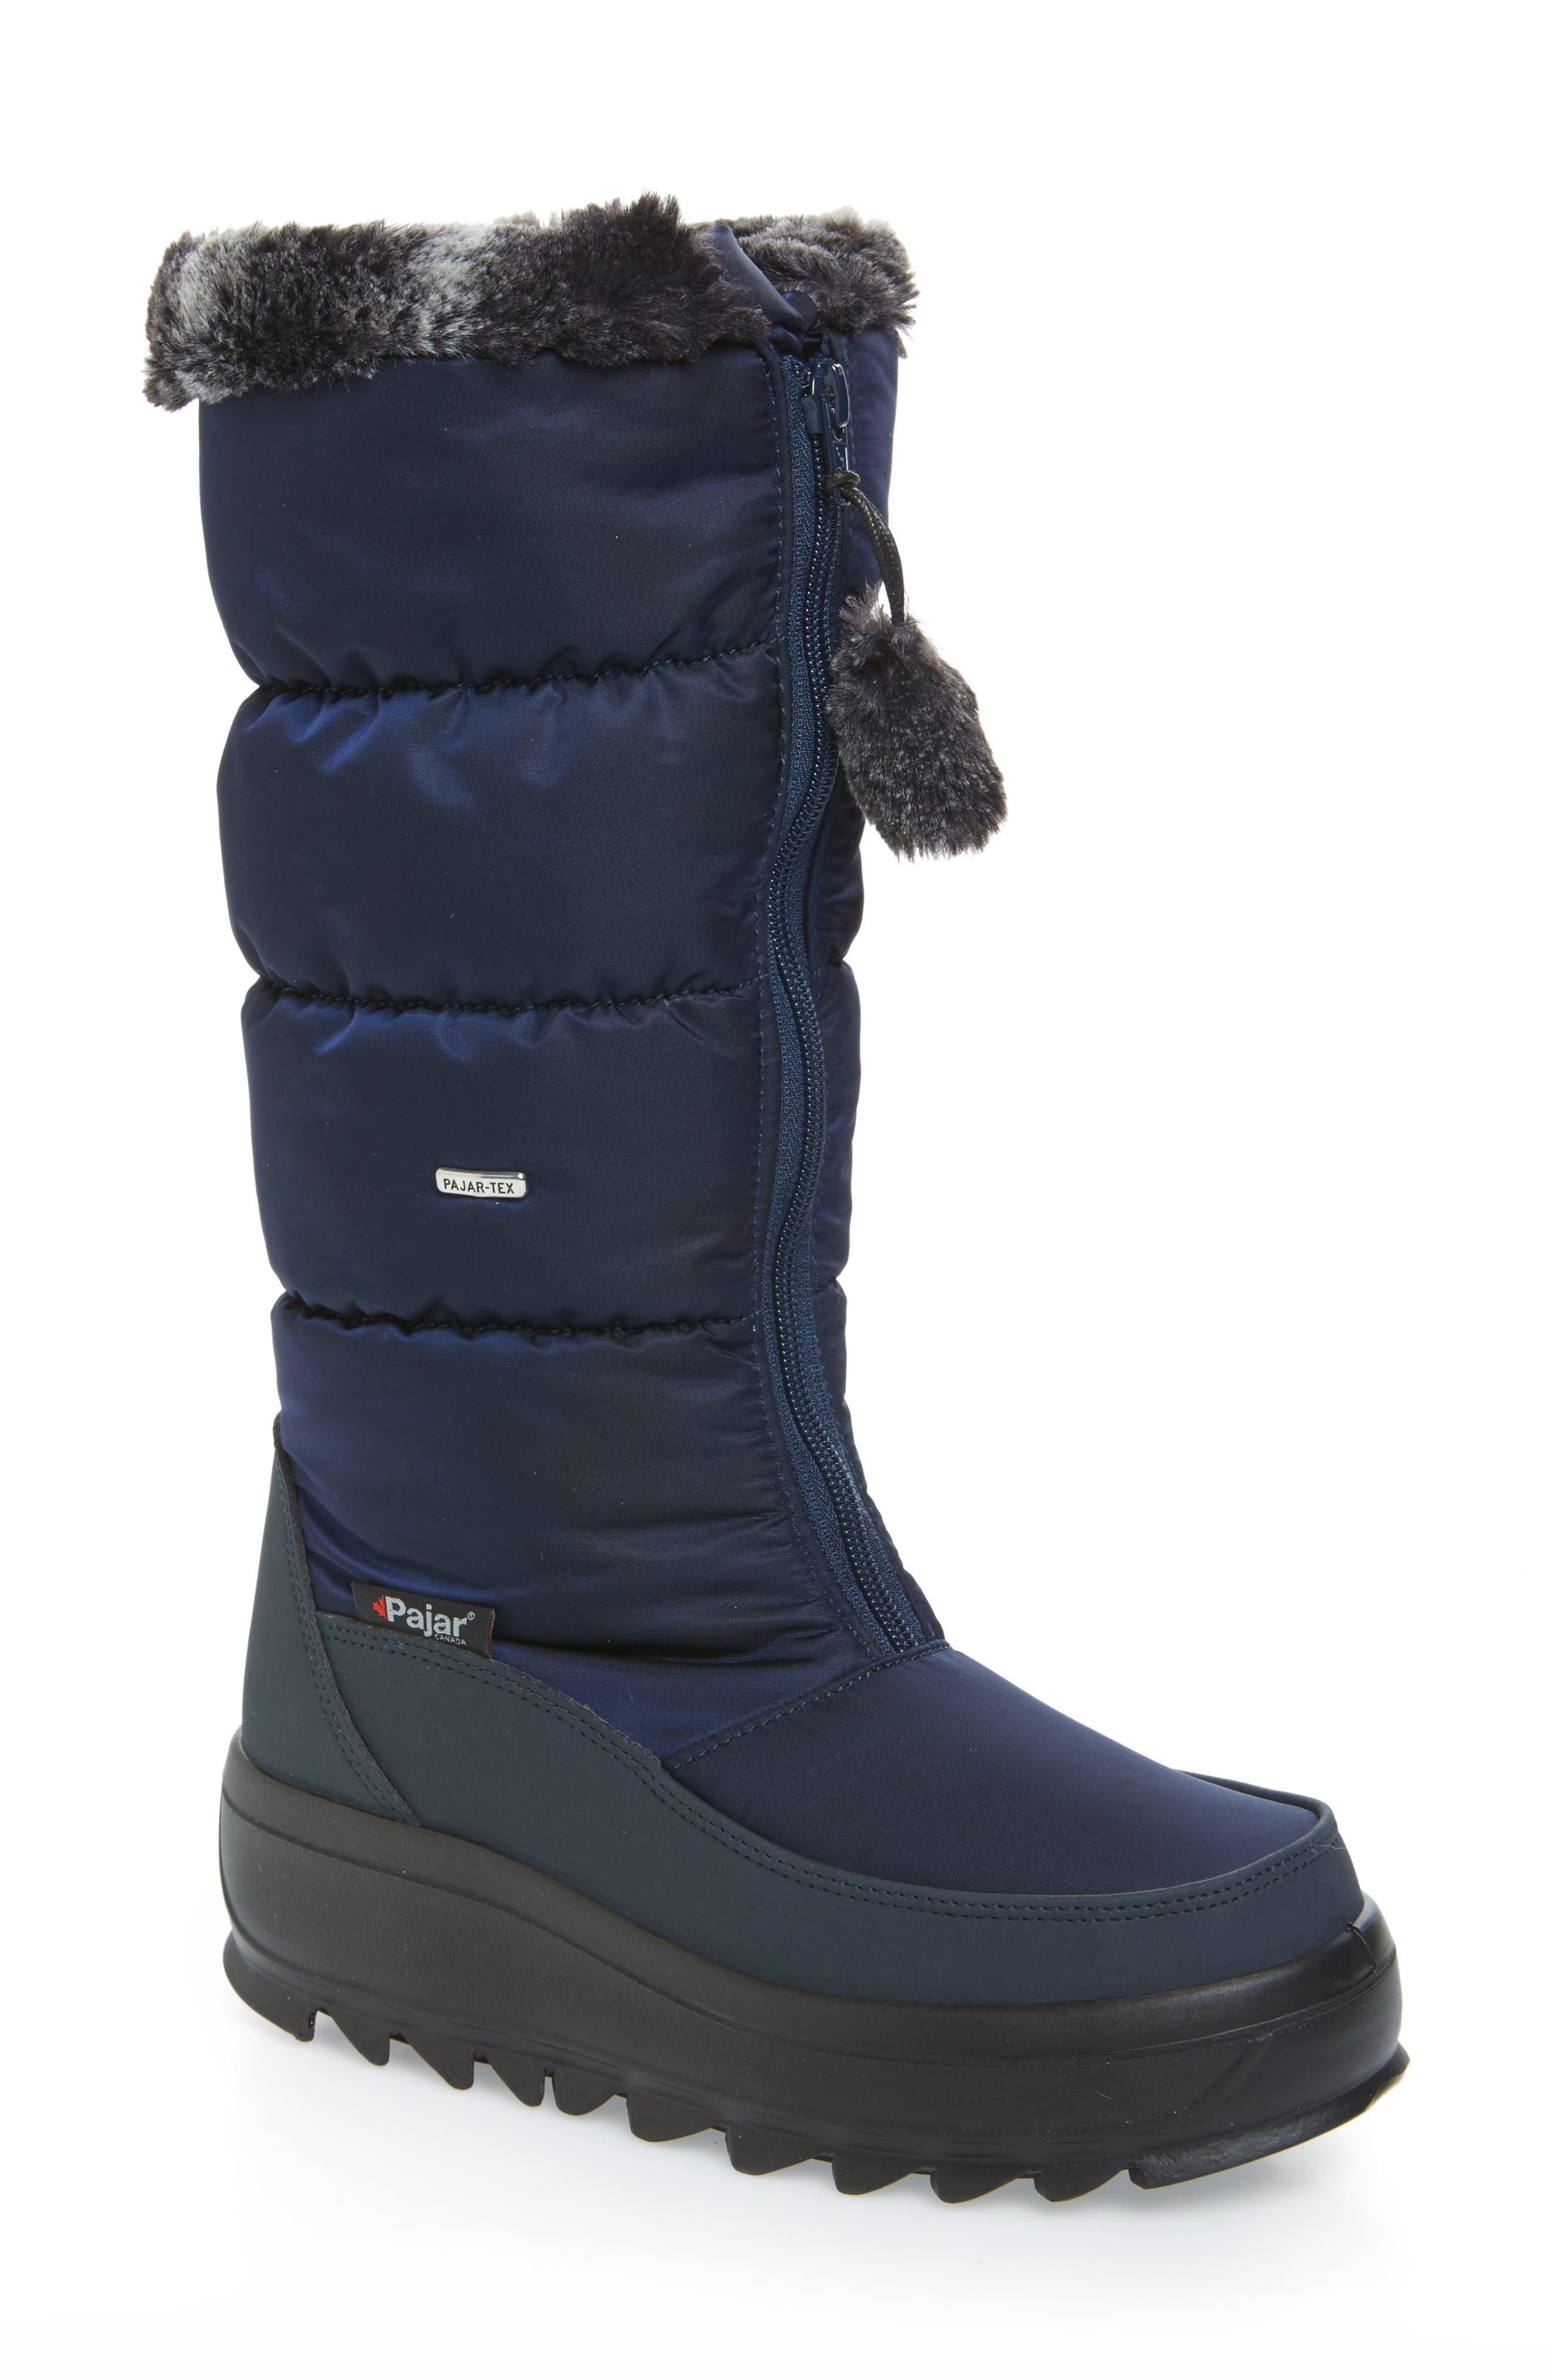 Toboggan 2 Faux Fur Trim Insulated Waterproof Boot,                             Main thumbnail 1, color,                             NAVY FABRIC